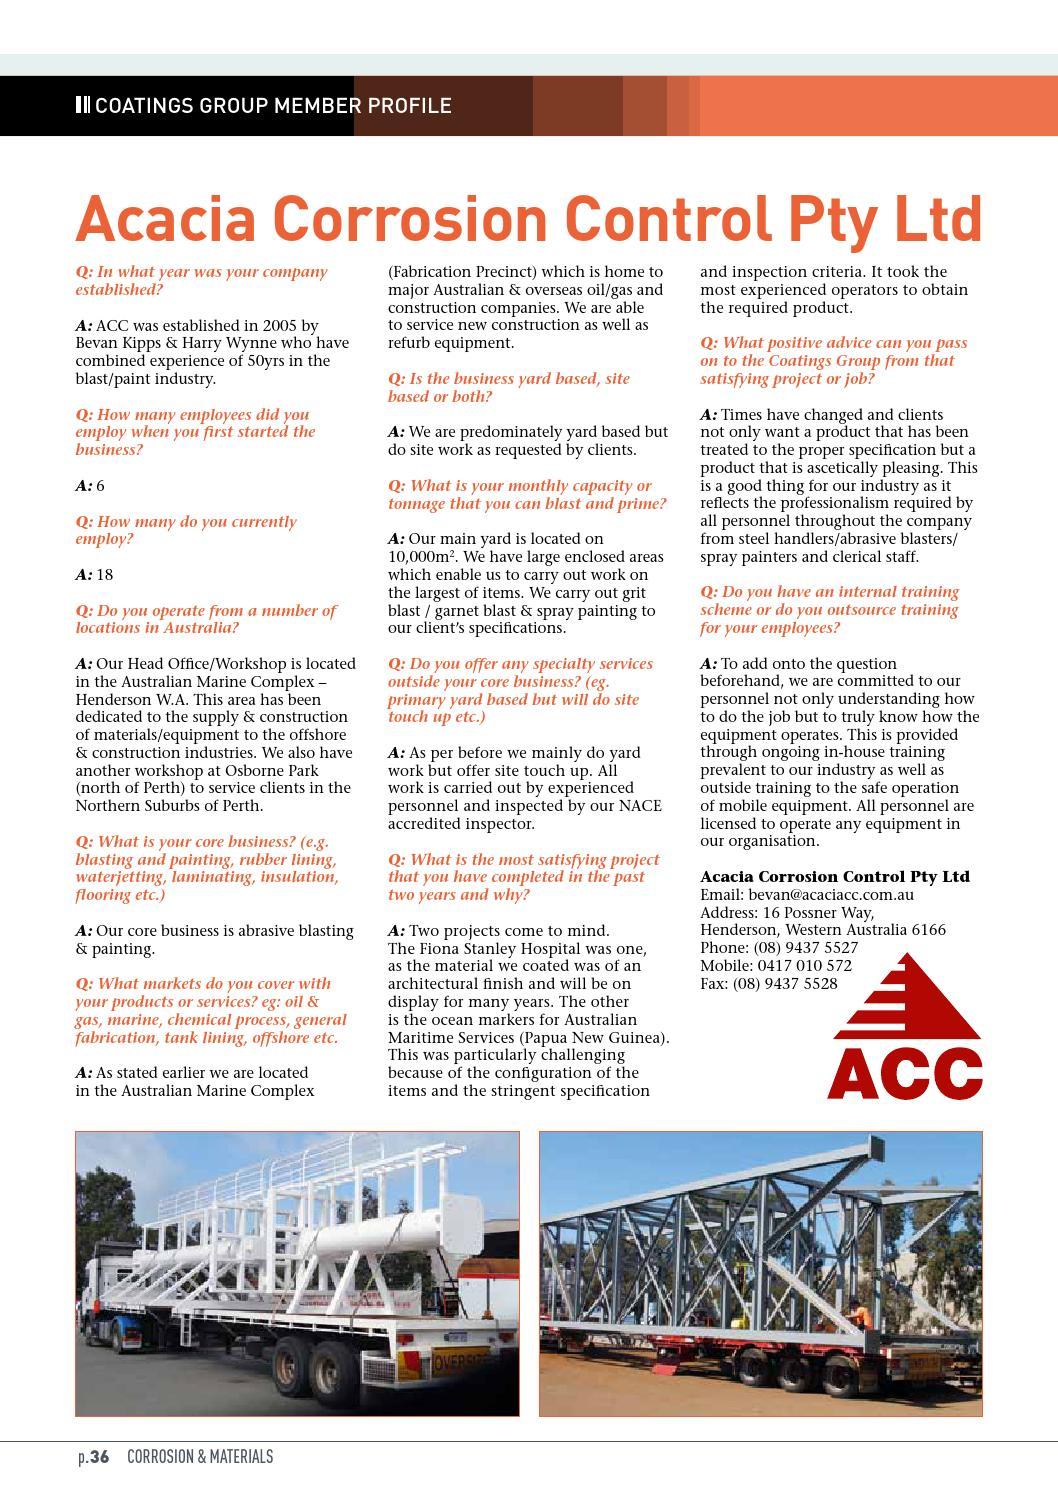 Corrosion & Materials June 2013 by Australasian Corrosion